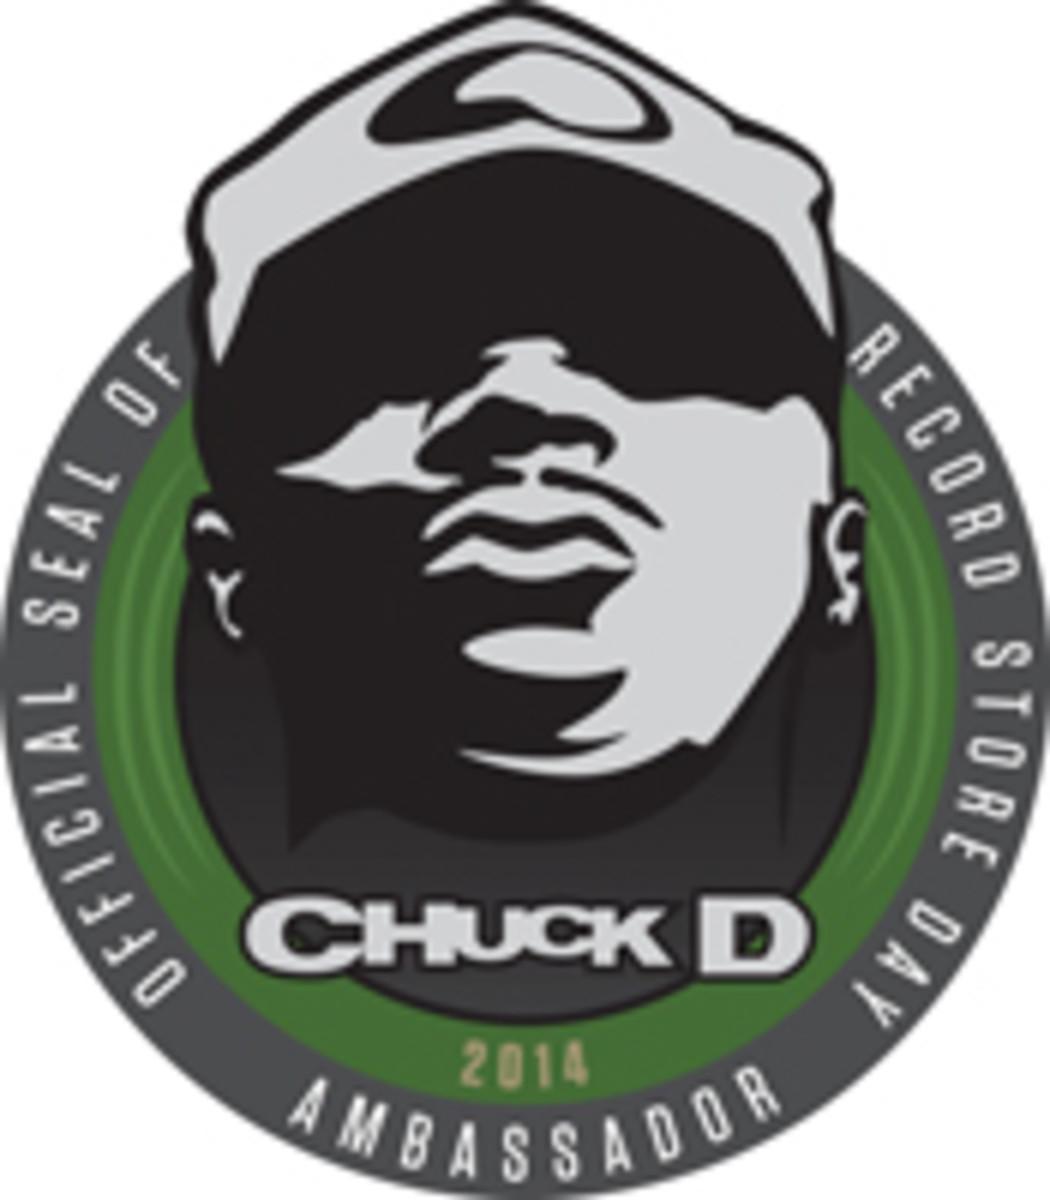 Chuck D Record Store Day Ambassador 2014